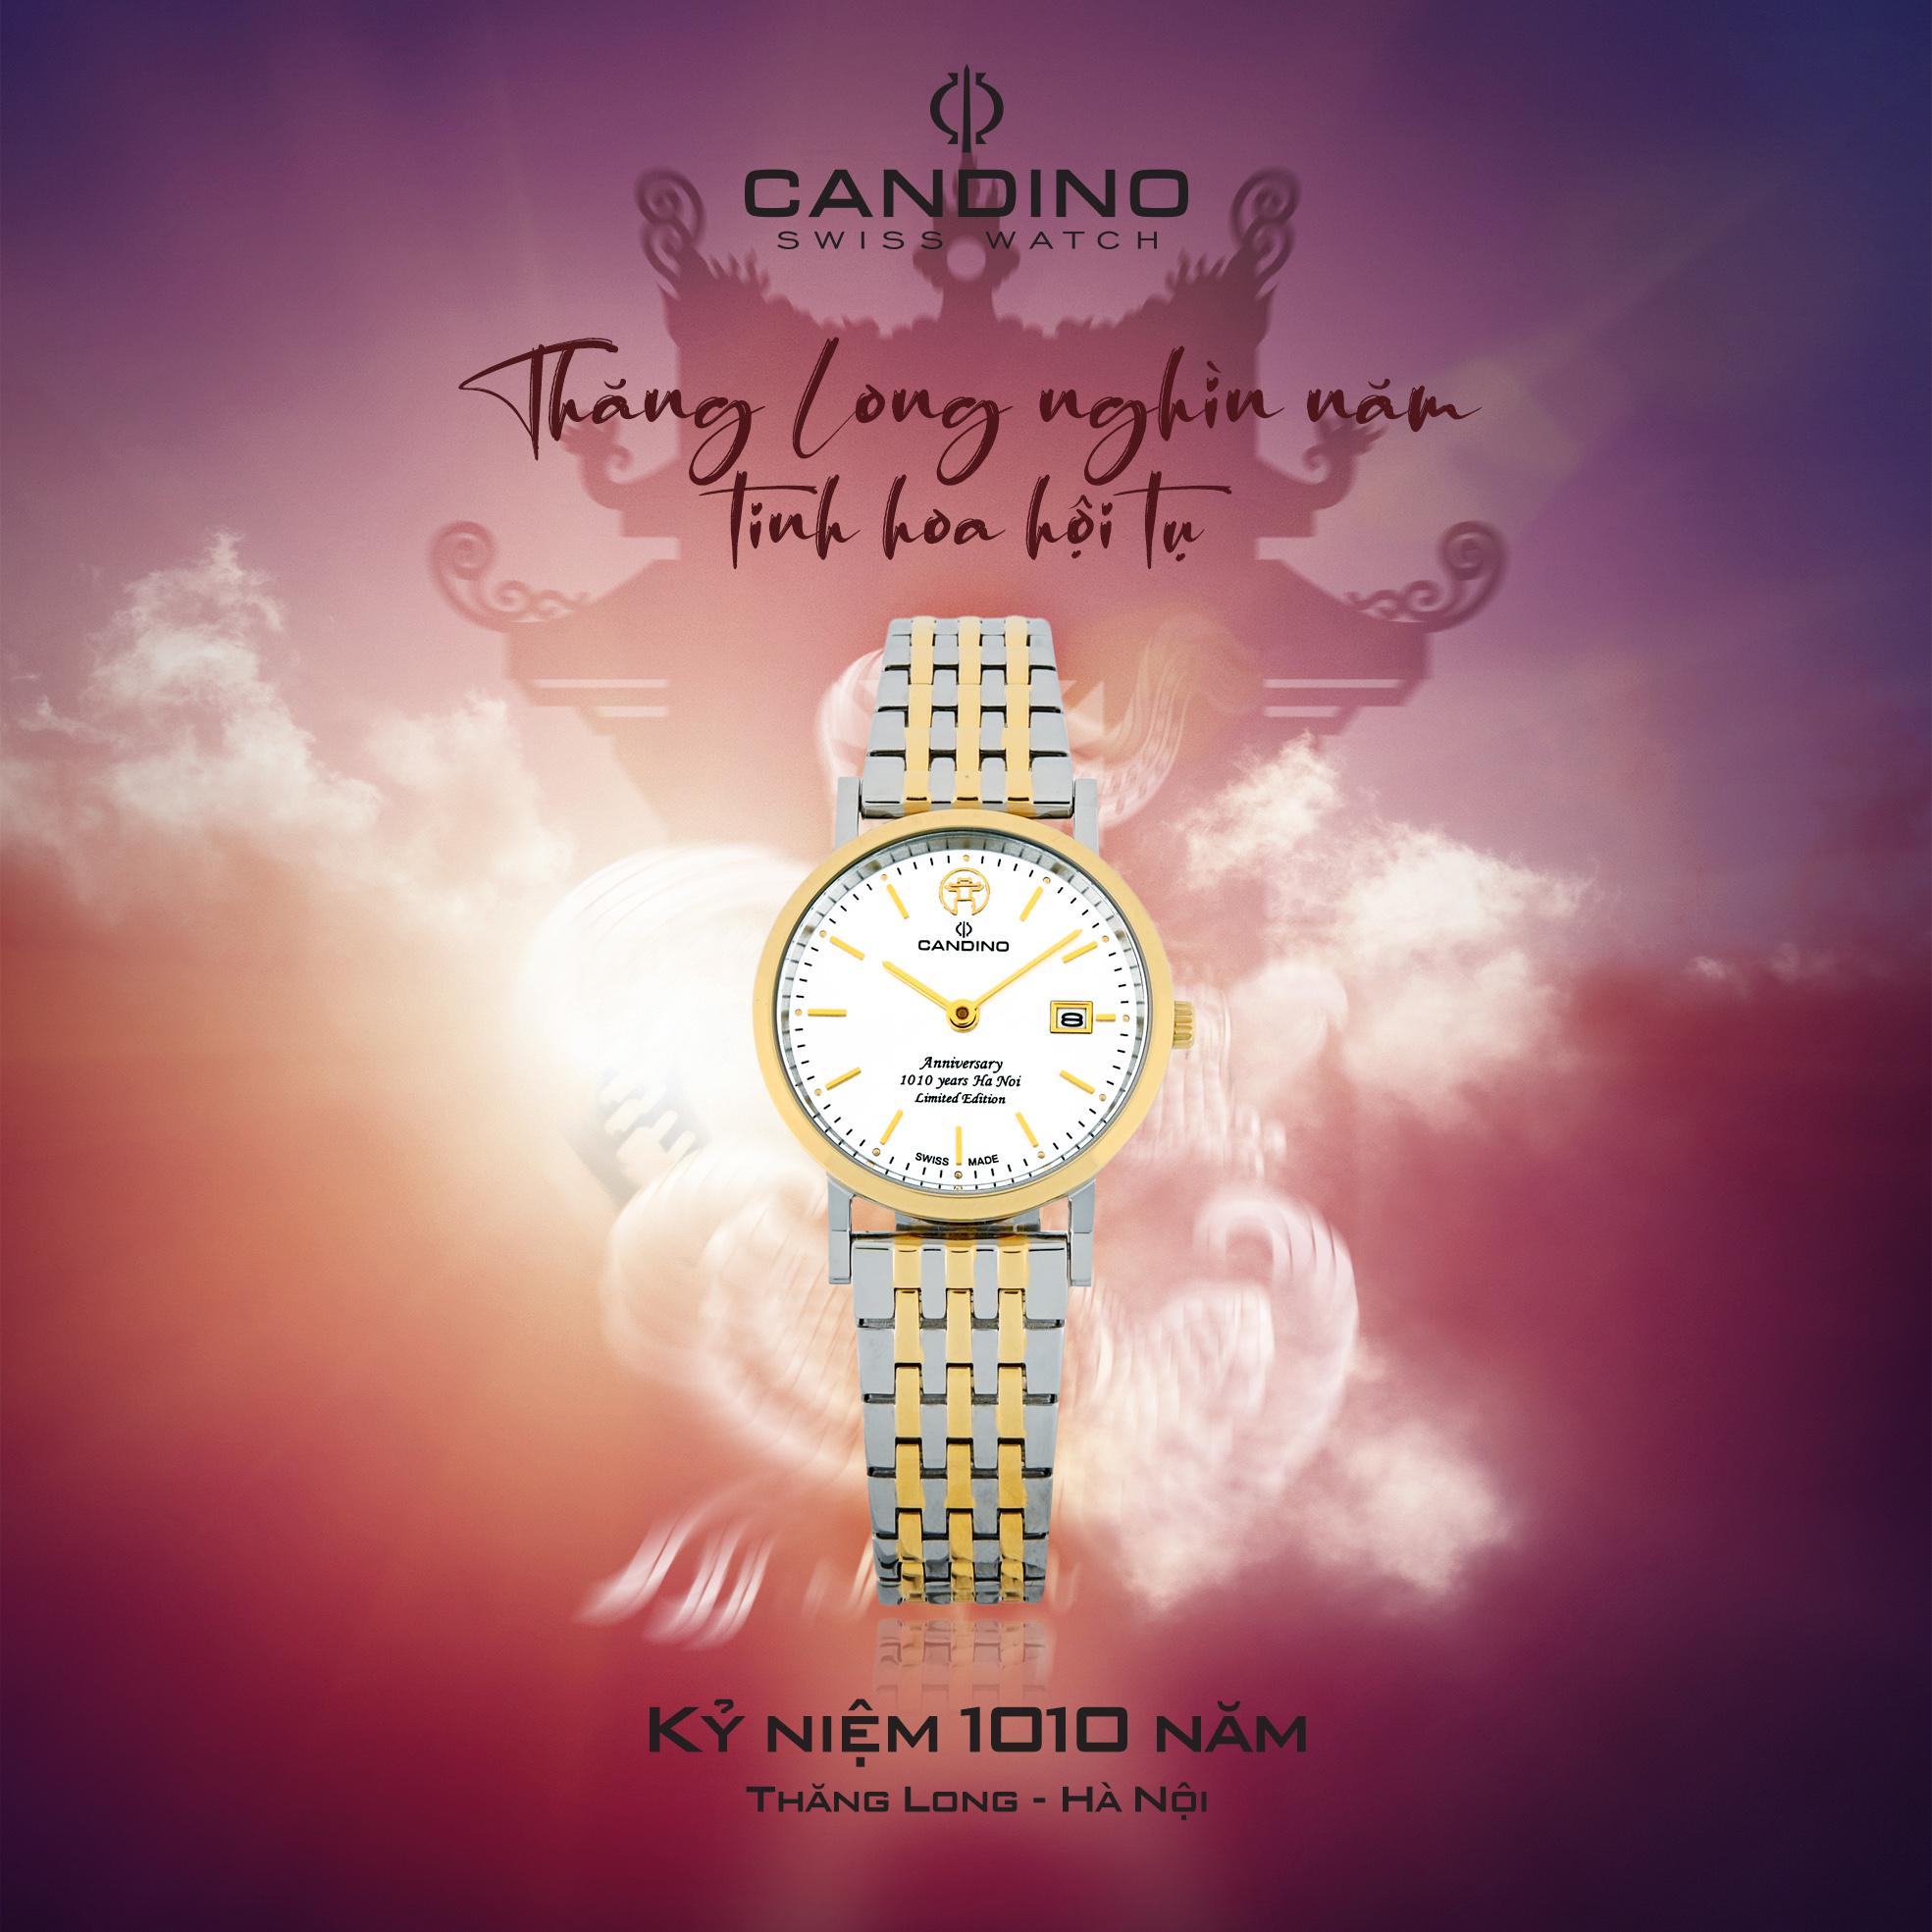 Đồng hồ nữ CANDINO 1010